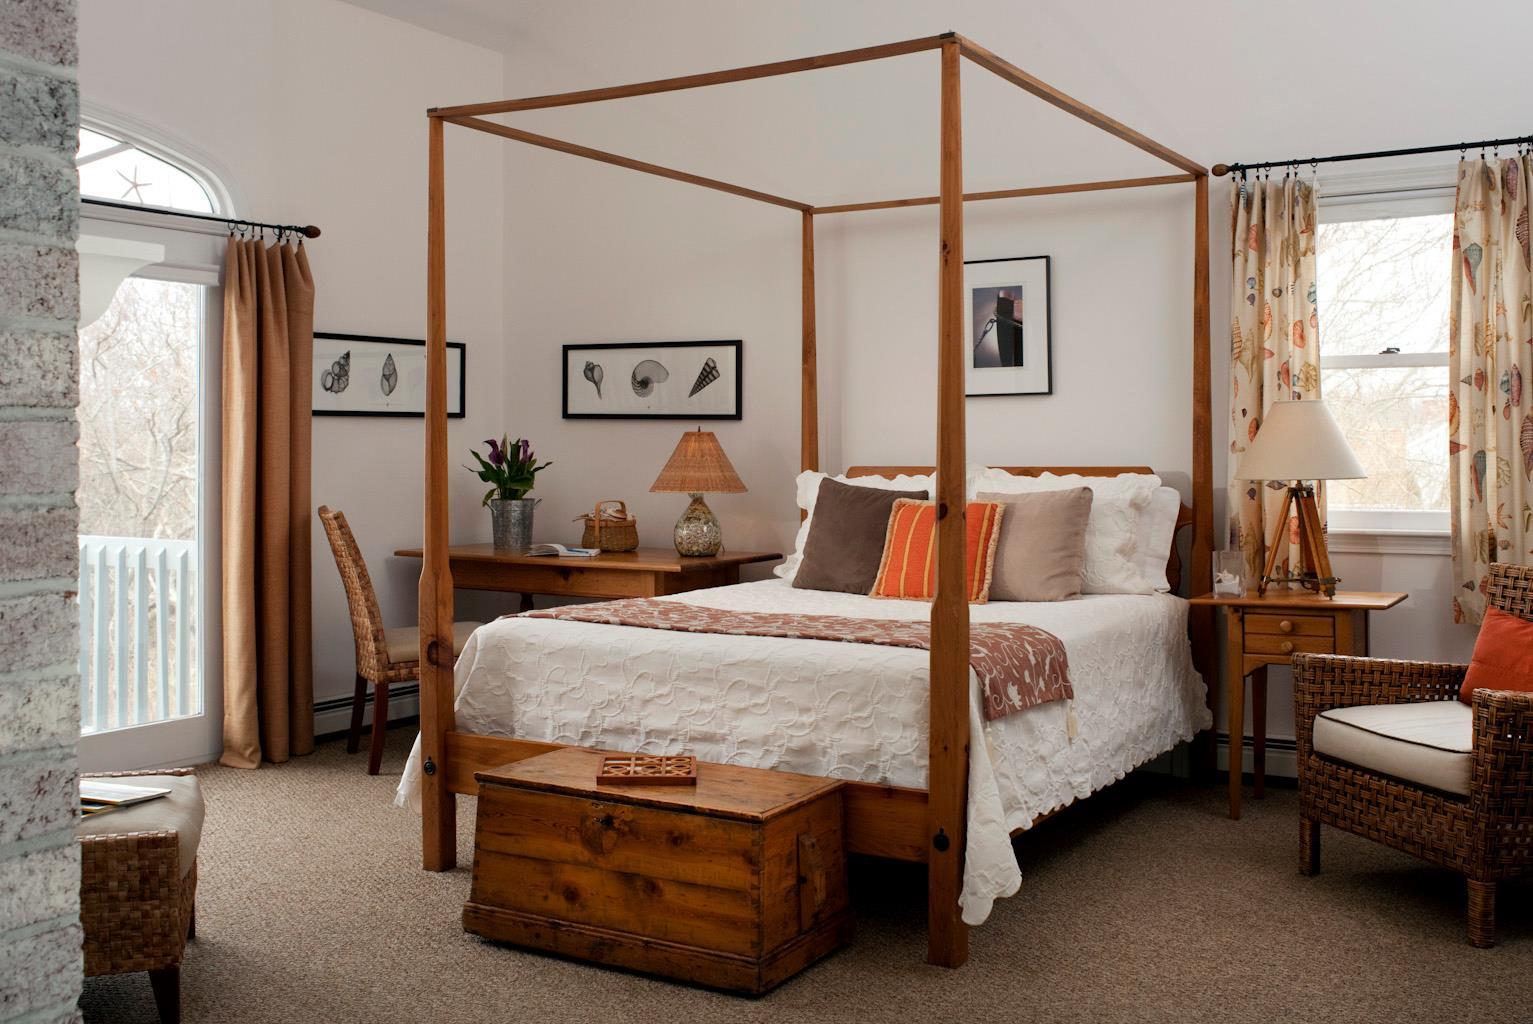 Romantic Inns Cape Cod